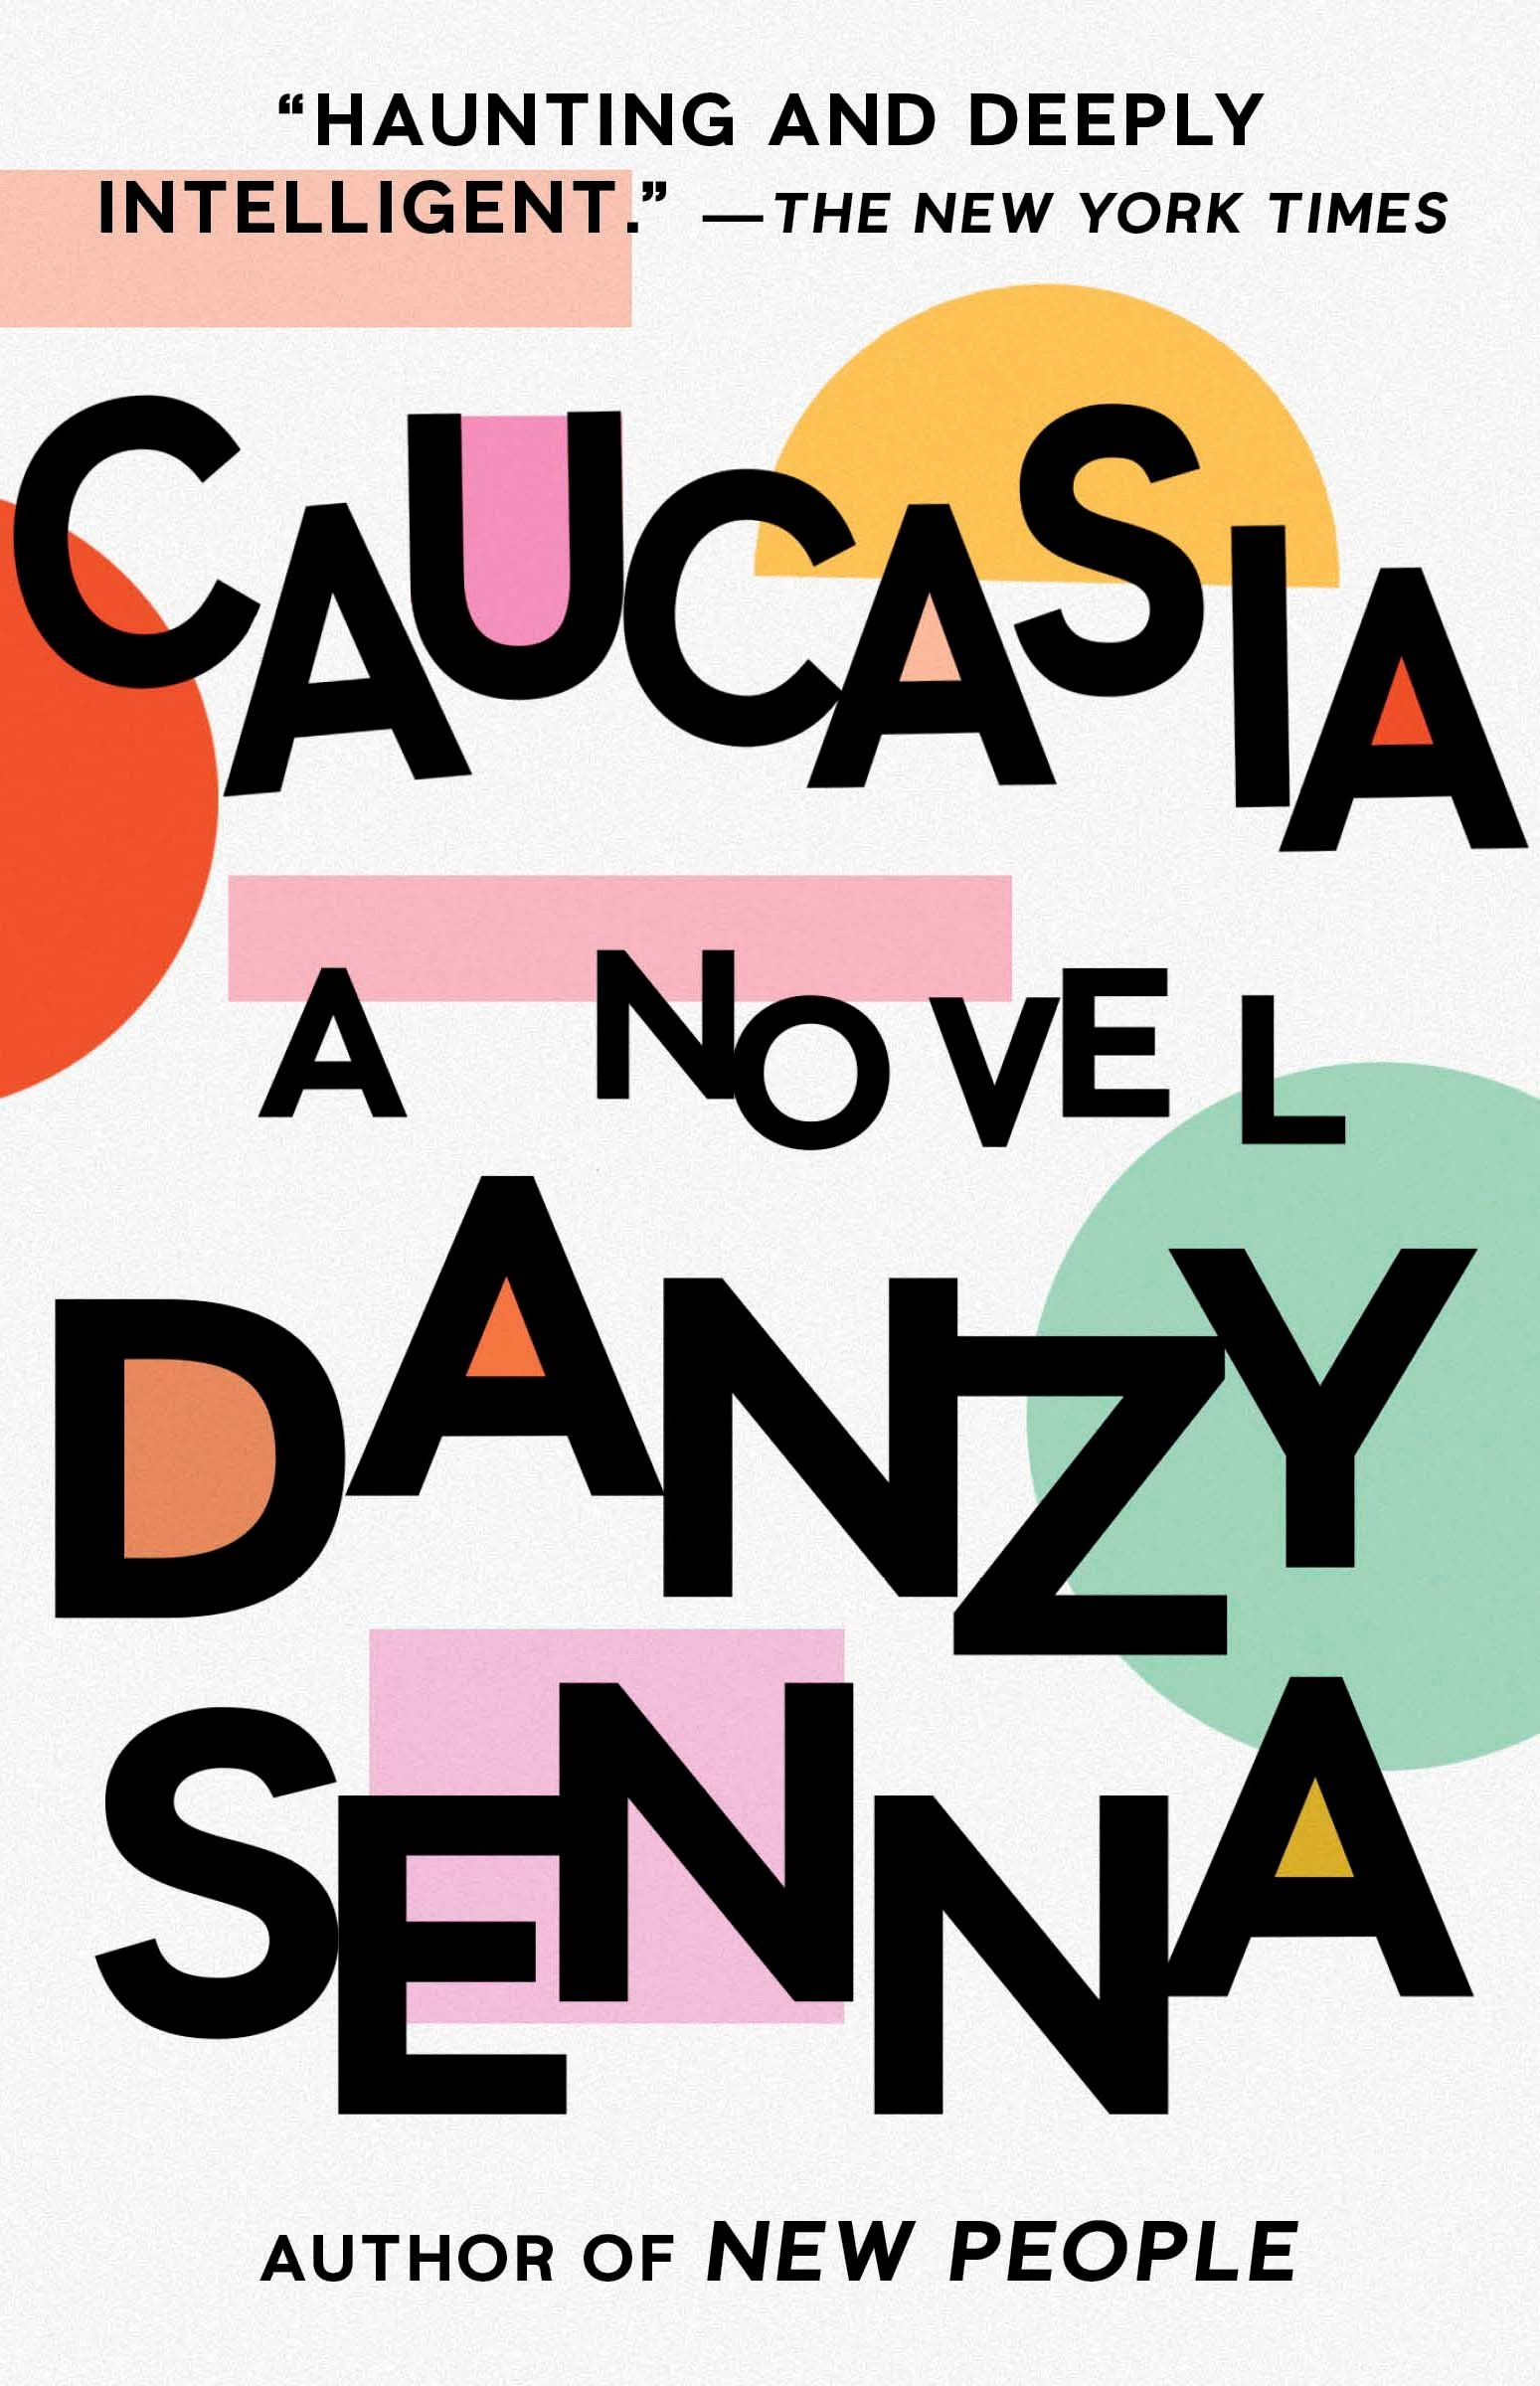 caucasia danzy senna summary